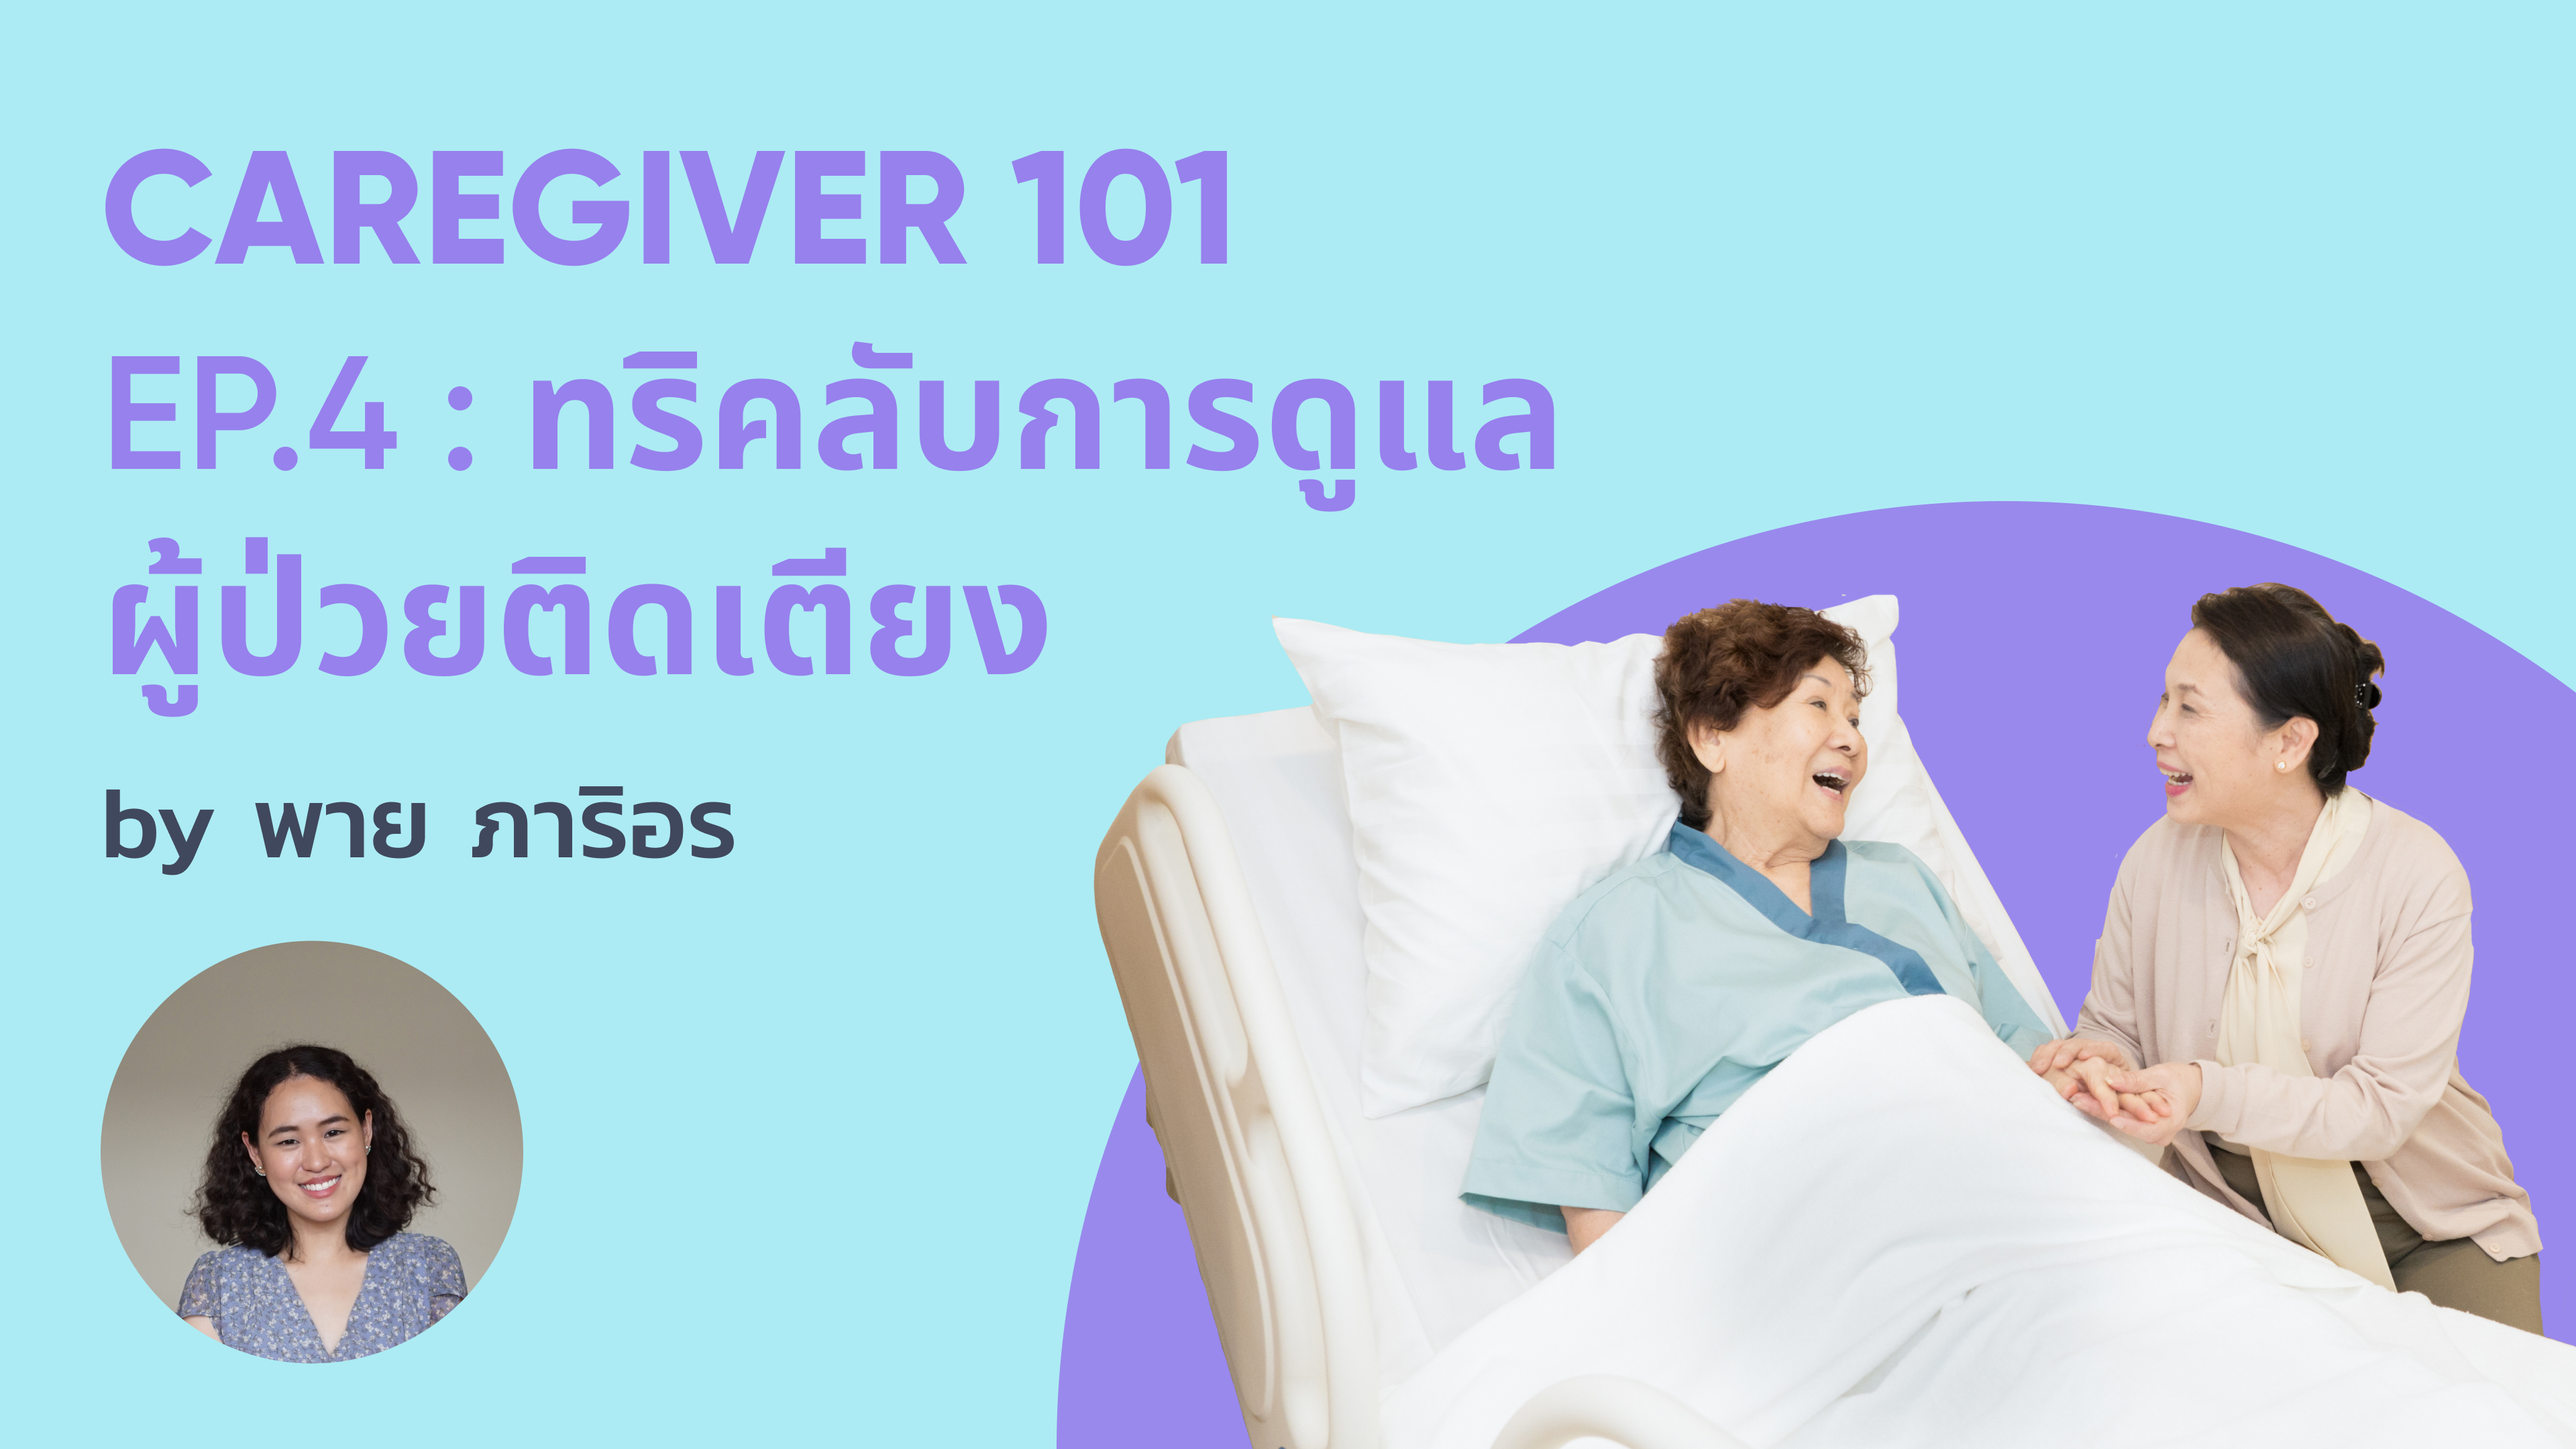 CAREGIVER 101 Ep. 4 : ทริคลับการดูแลผู้ป่วยติดเตียง